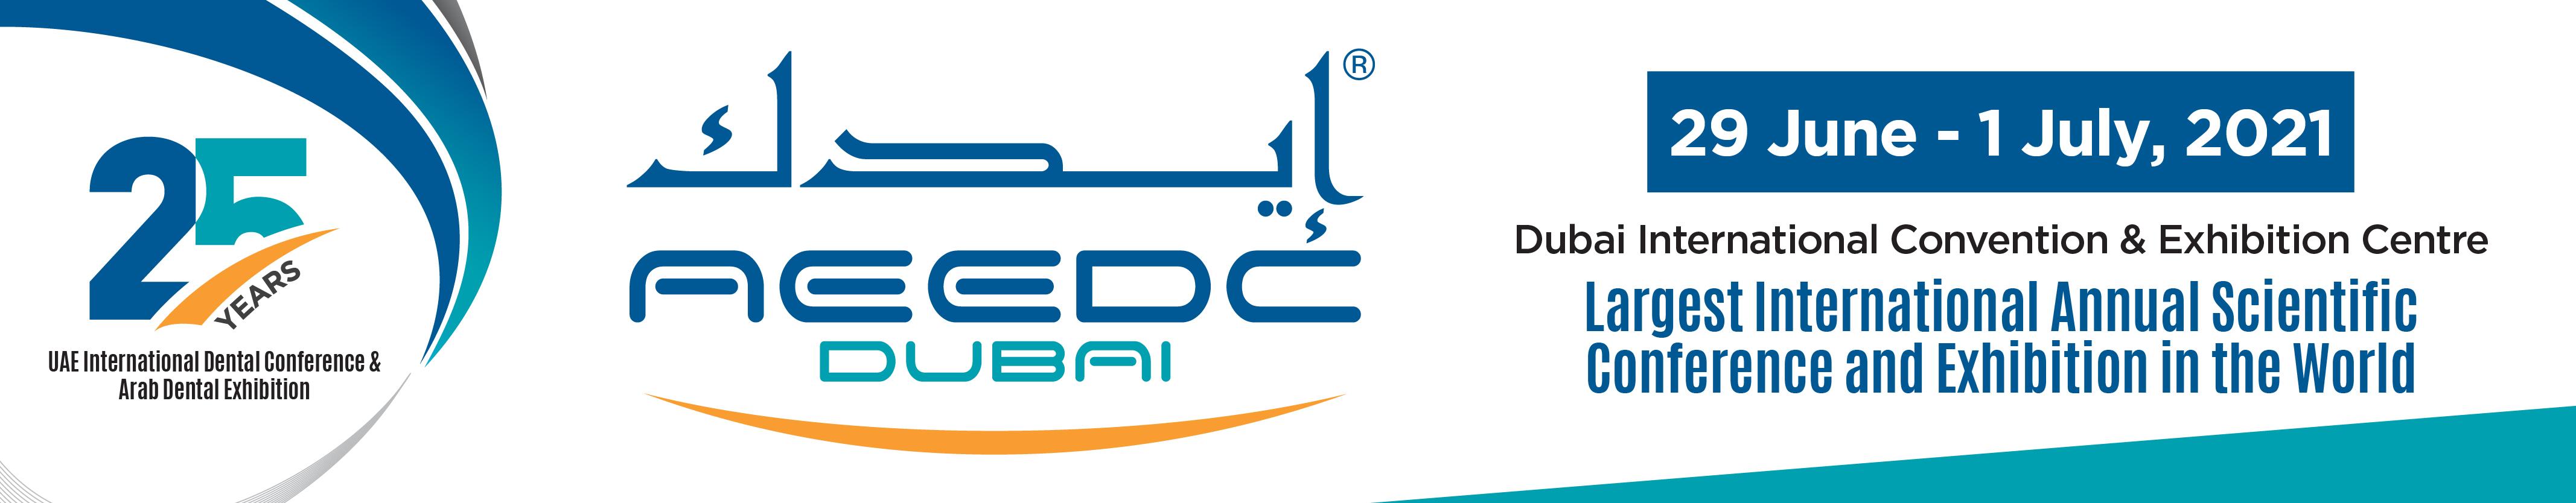 UAE International Dental Conference & Arab Dental Exhibition  - AEEDC Dubai 2021